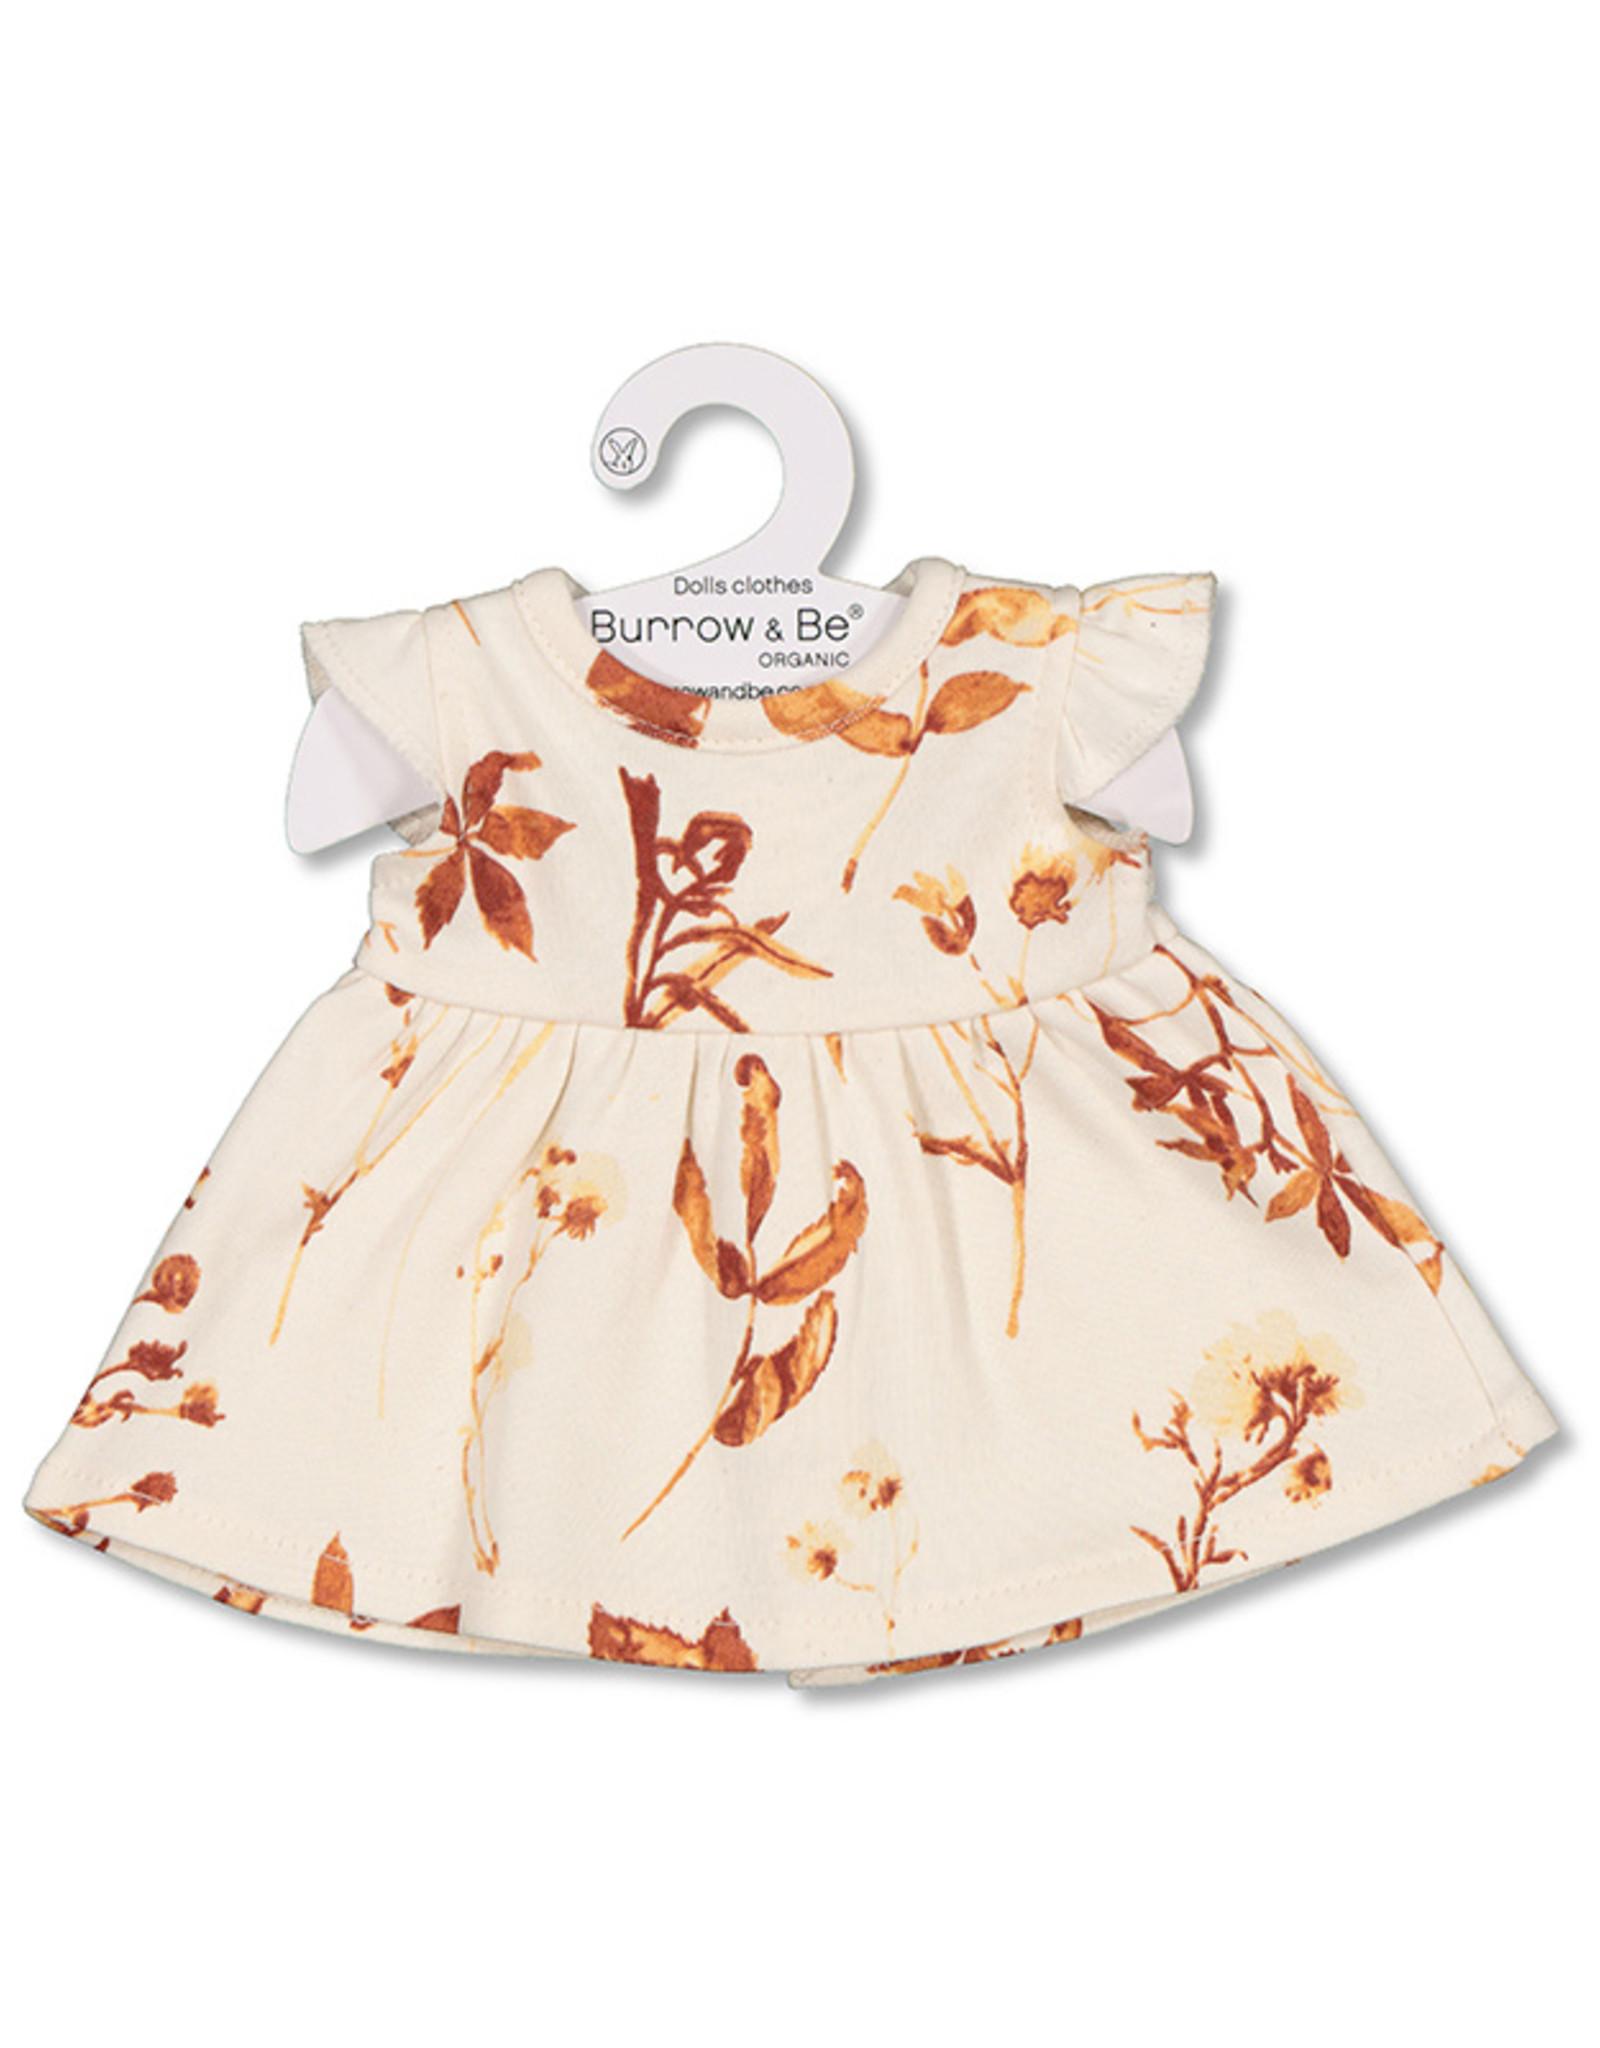 Burrow & Be Burrow & Be - Autumn Leaves Flutter Dolls Dress  38cm